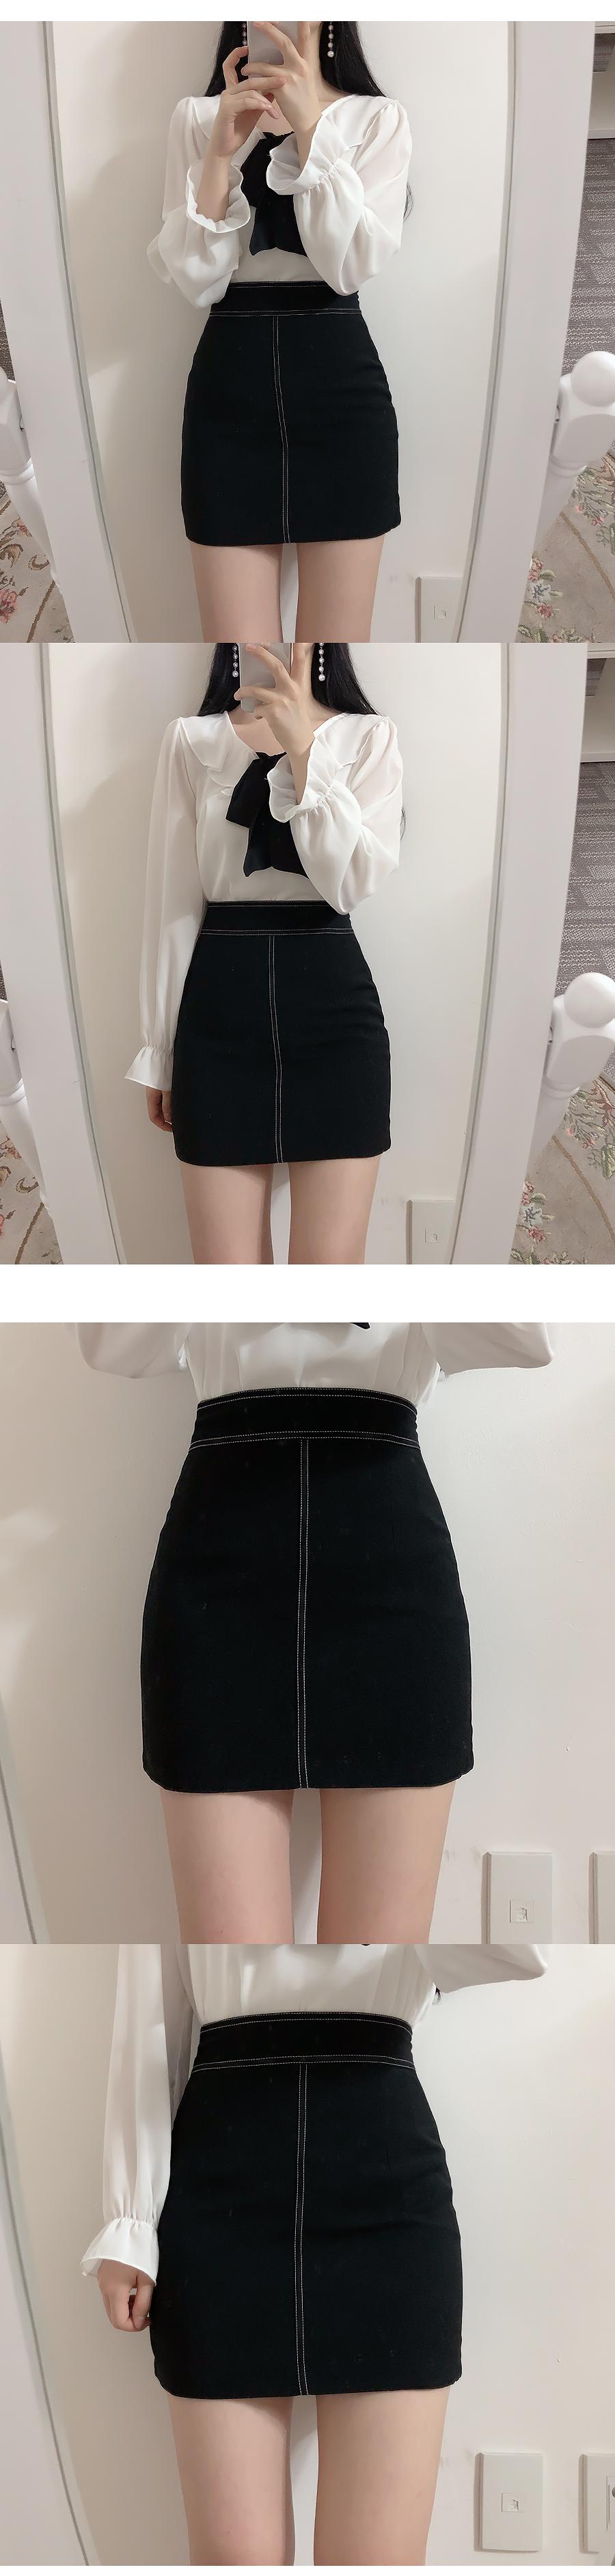 Stitched mini skirt